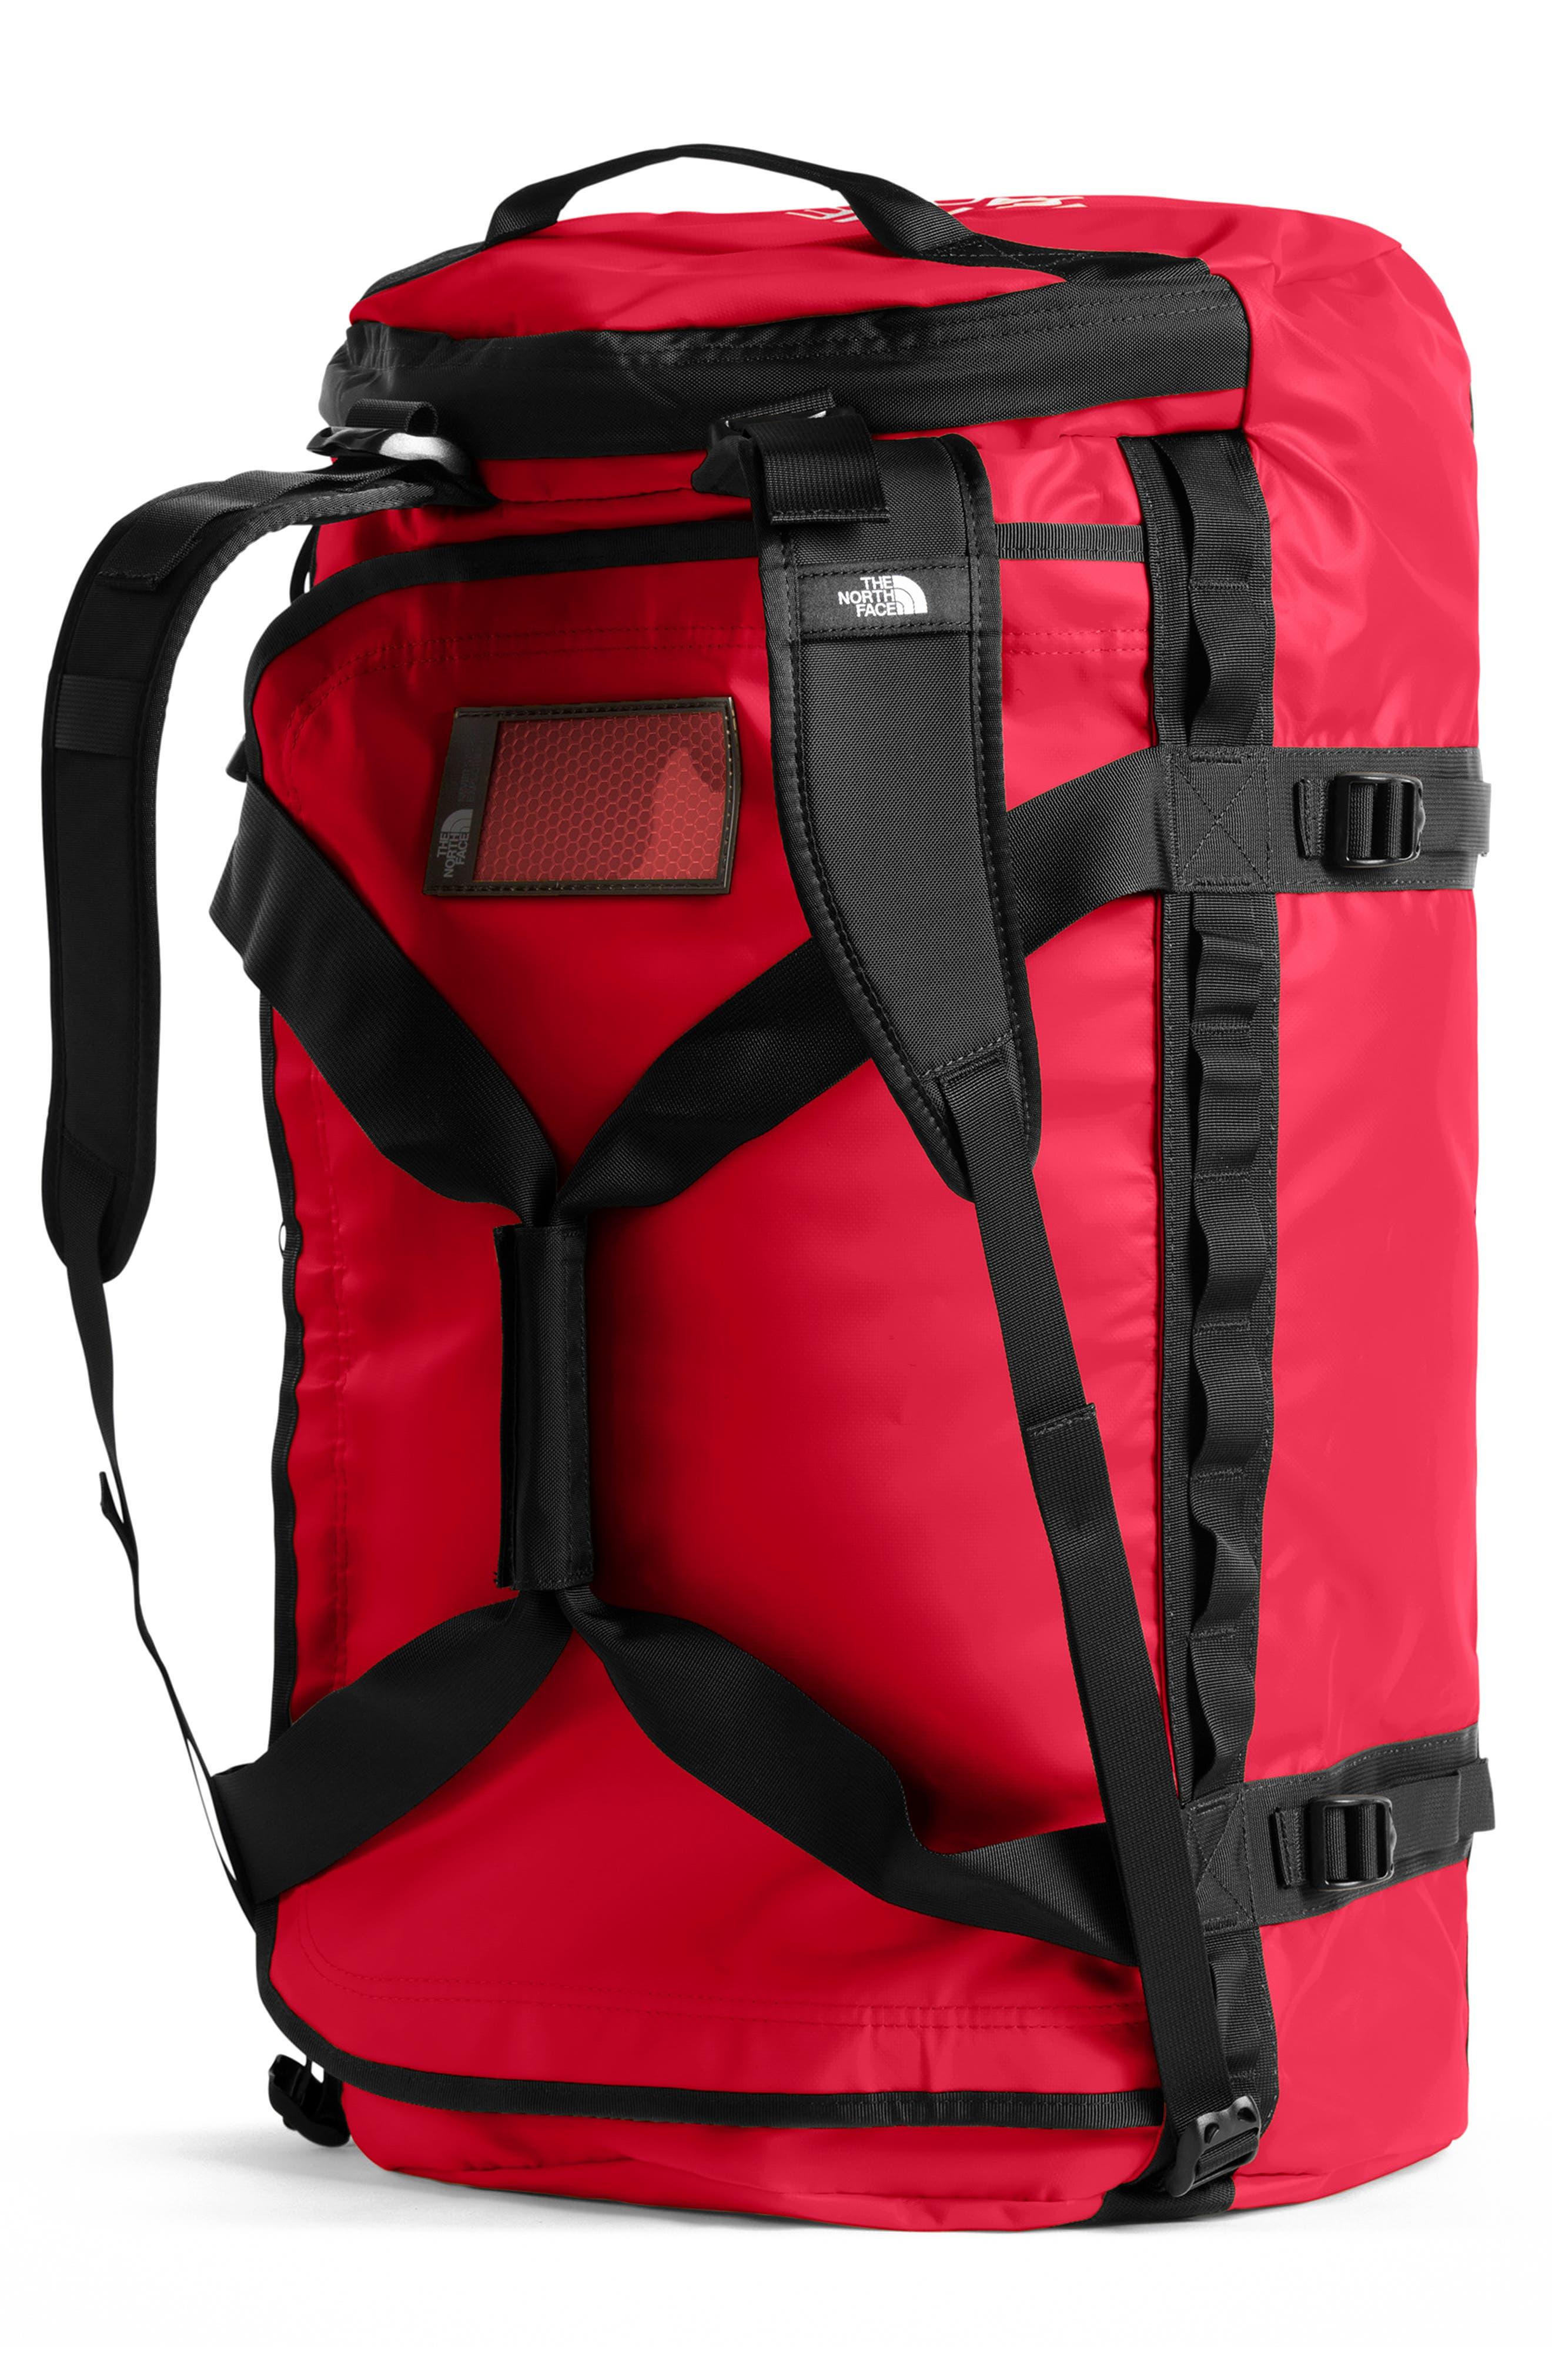 Base Camp Large Duffel Bag,                             Alternate thumbnail 2, color,                             RED/ BLACK